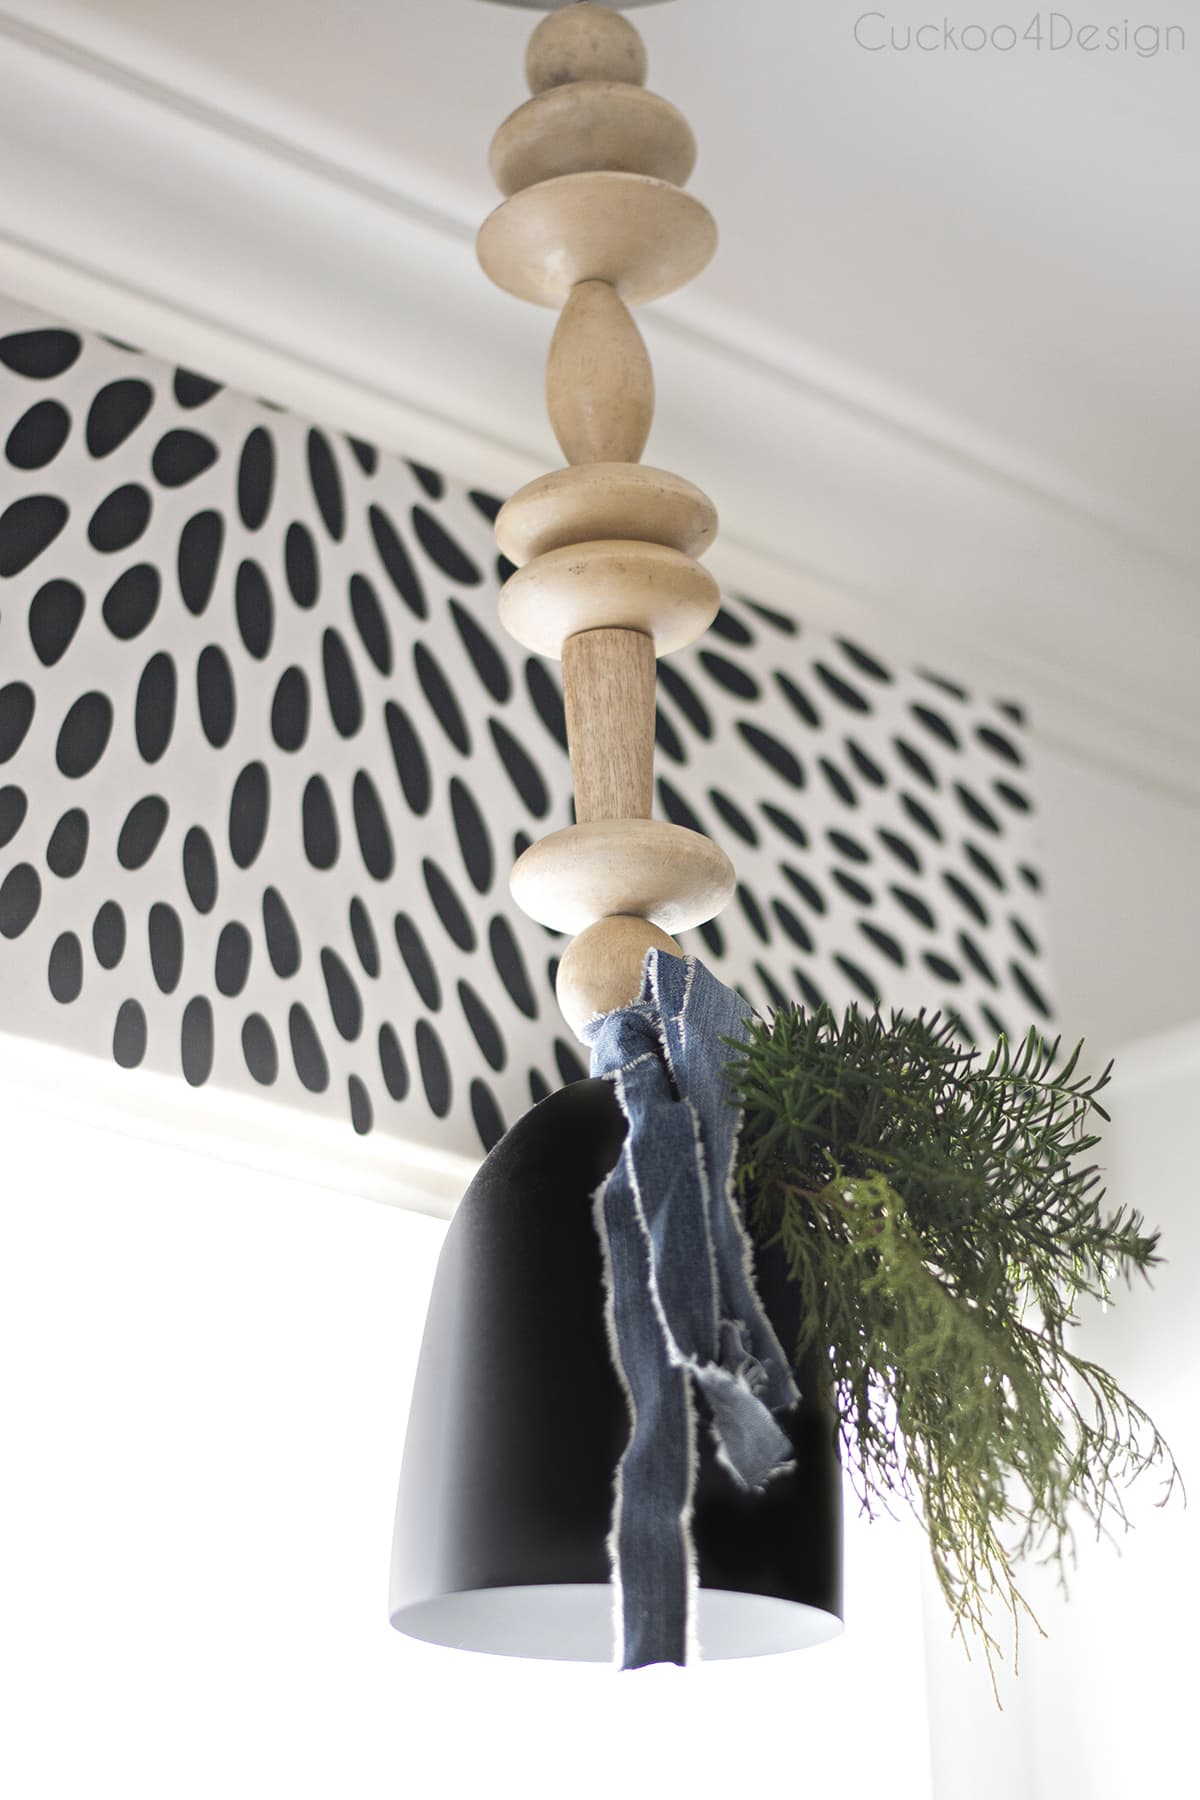 woodbead chandelier with Christmas decor